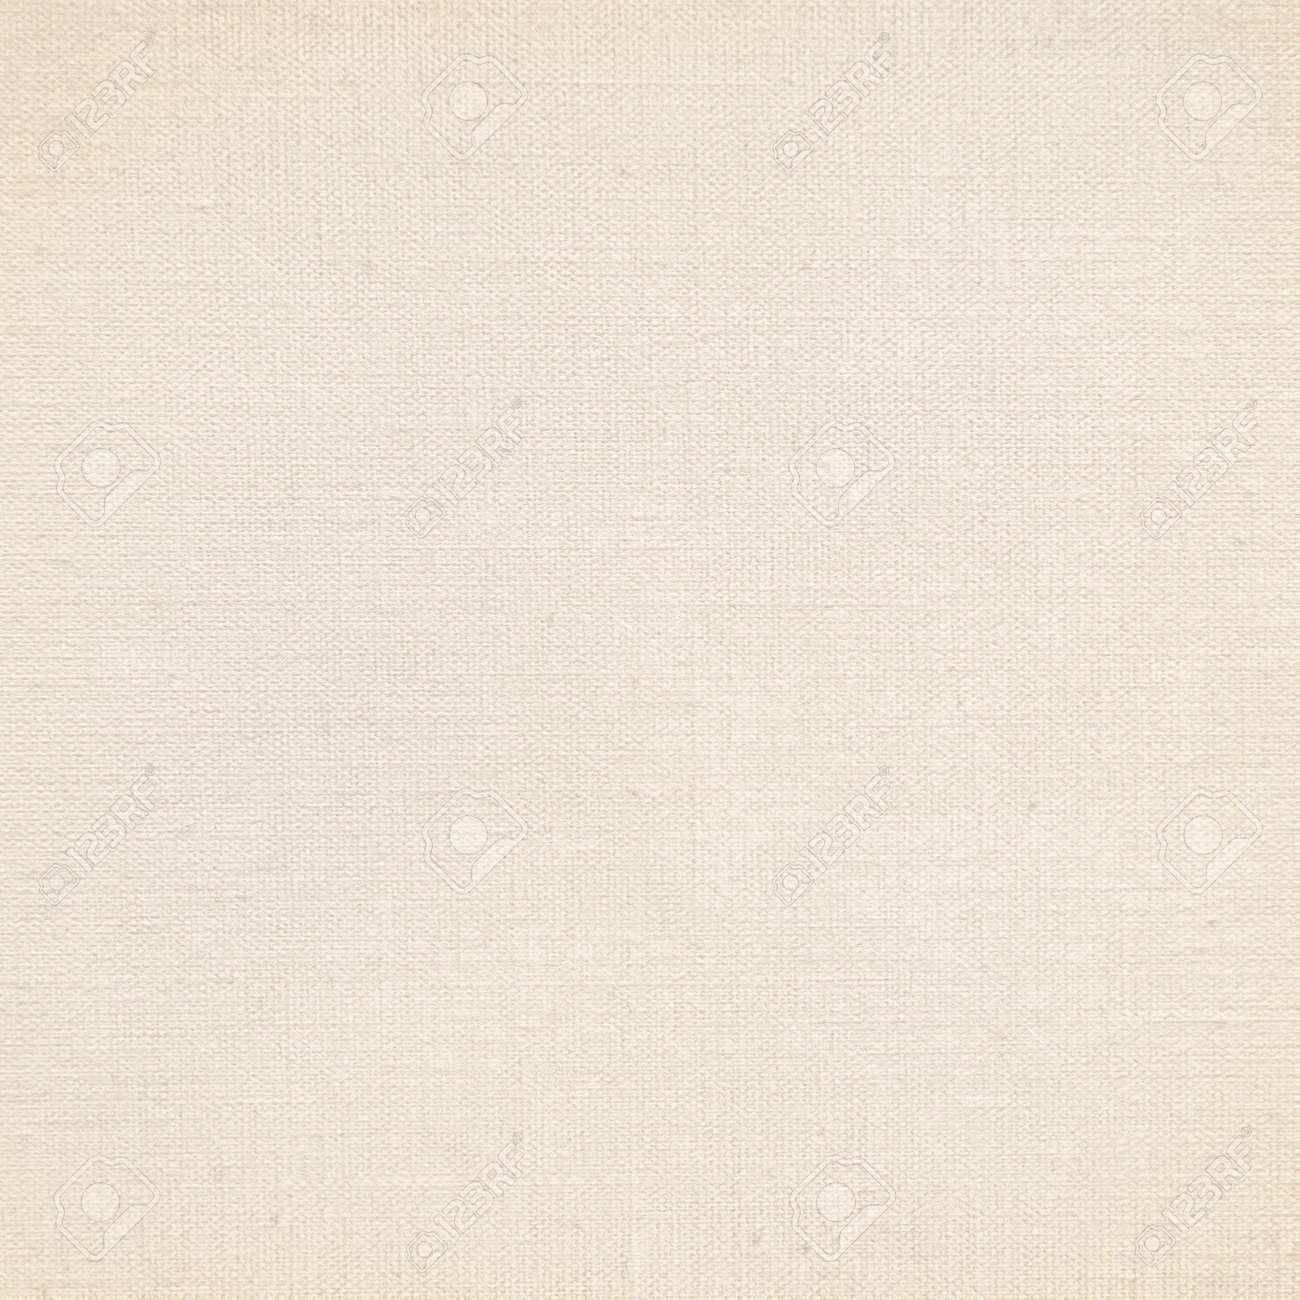 beige canvas texture paper background Stock Photo - 20993114